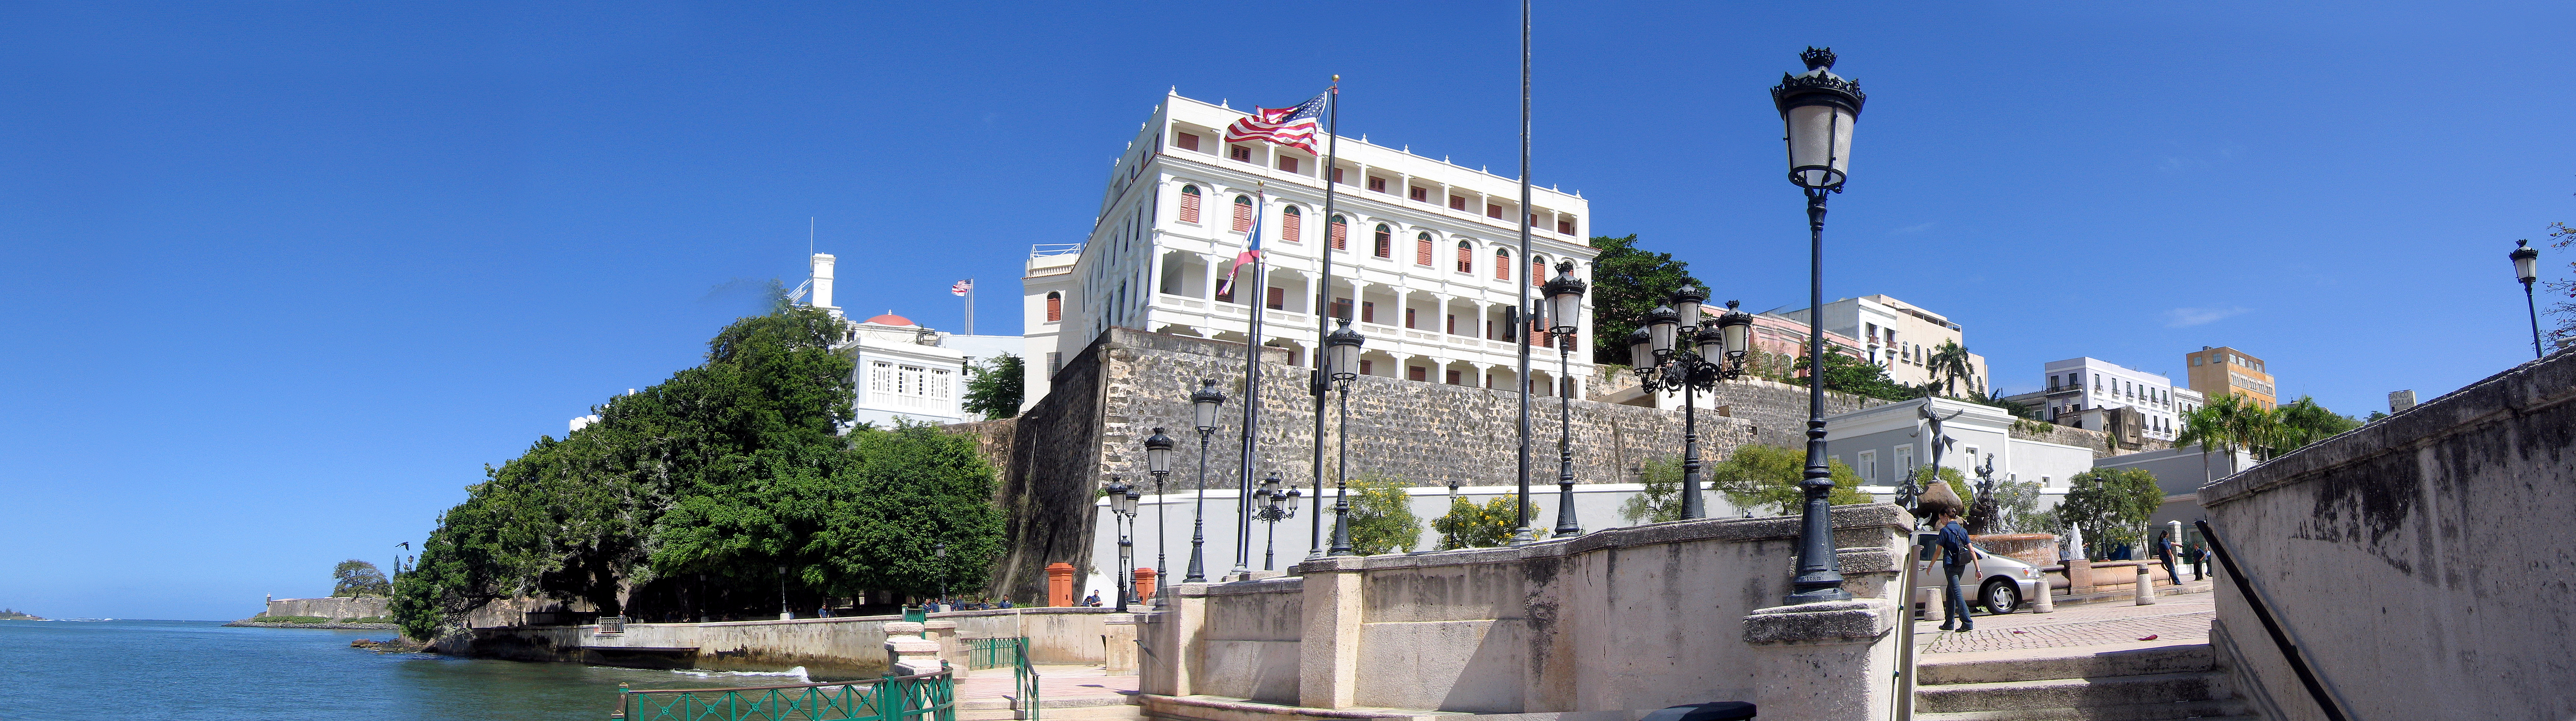 File Paseo De La Princesa Jpg Wikimedia Commons